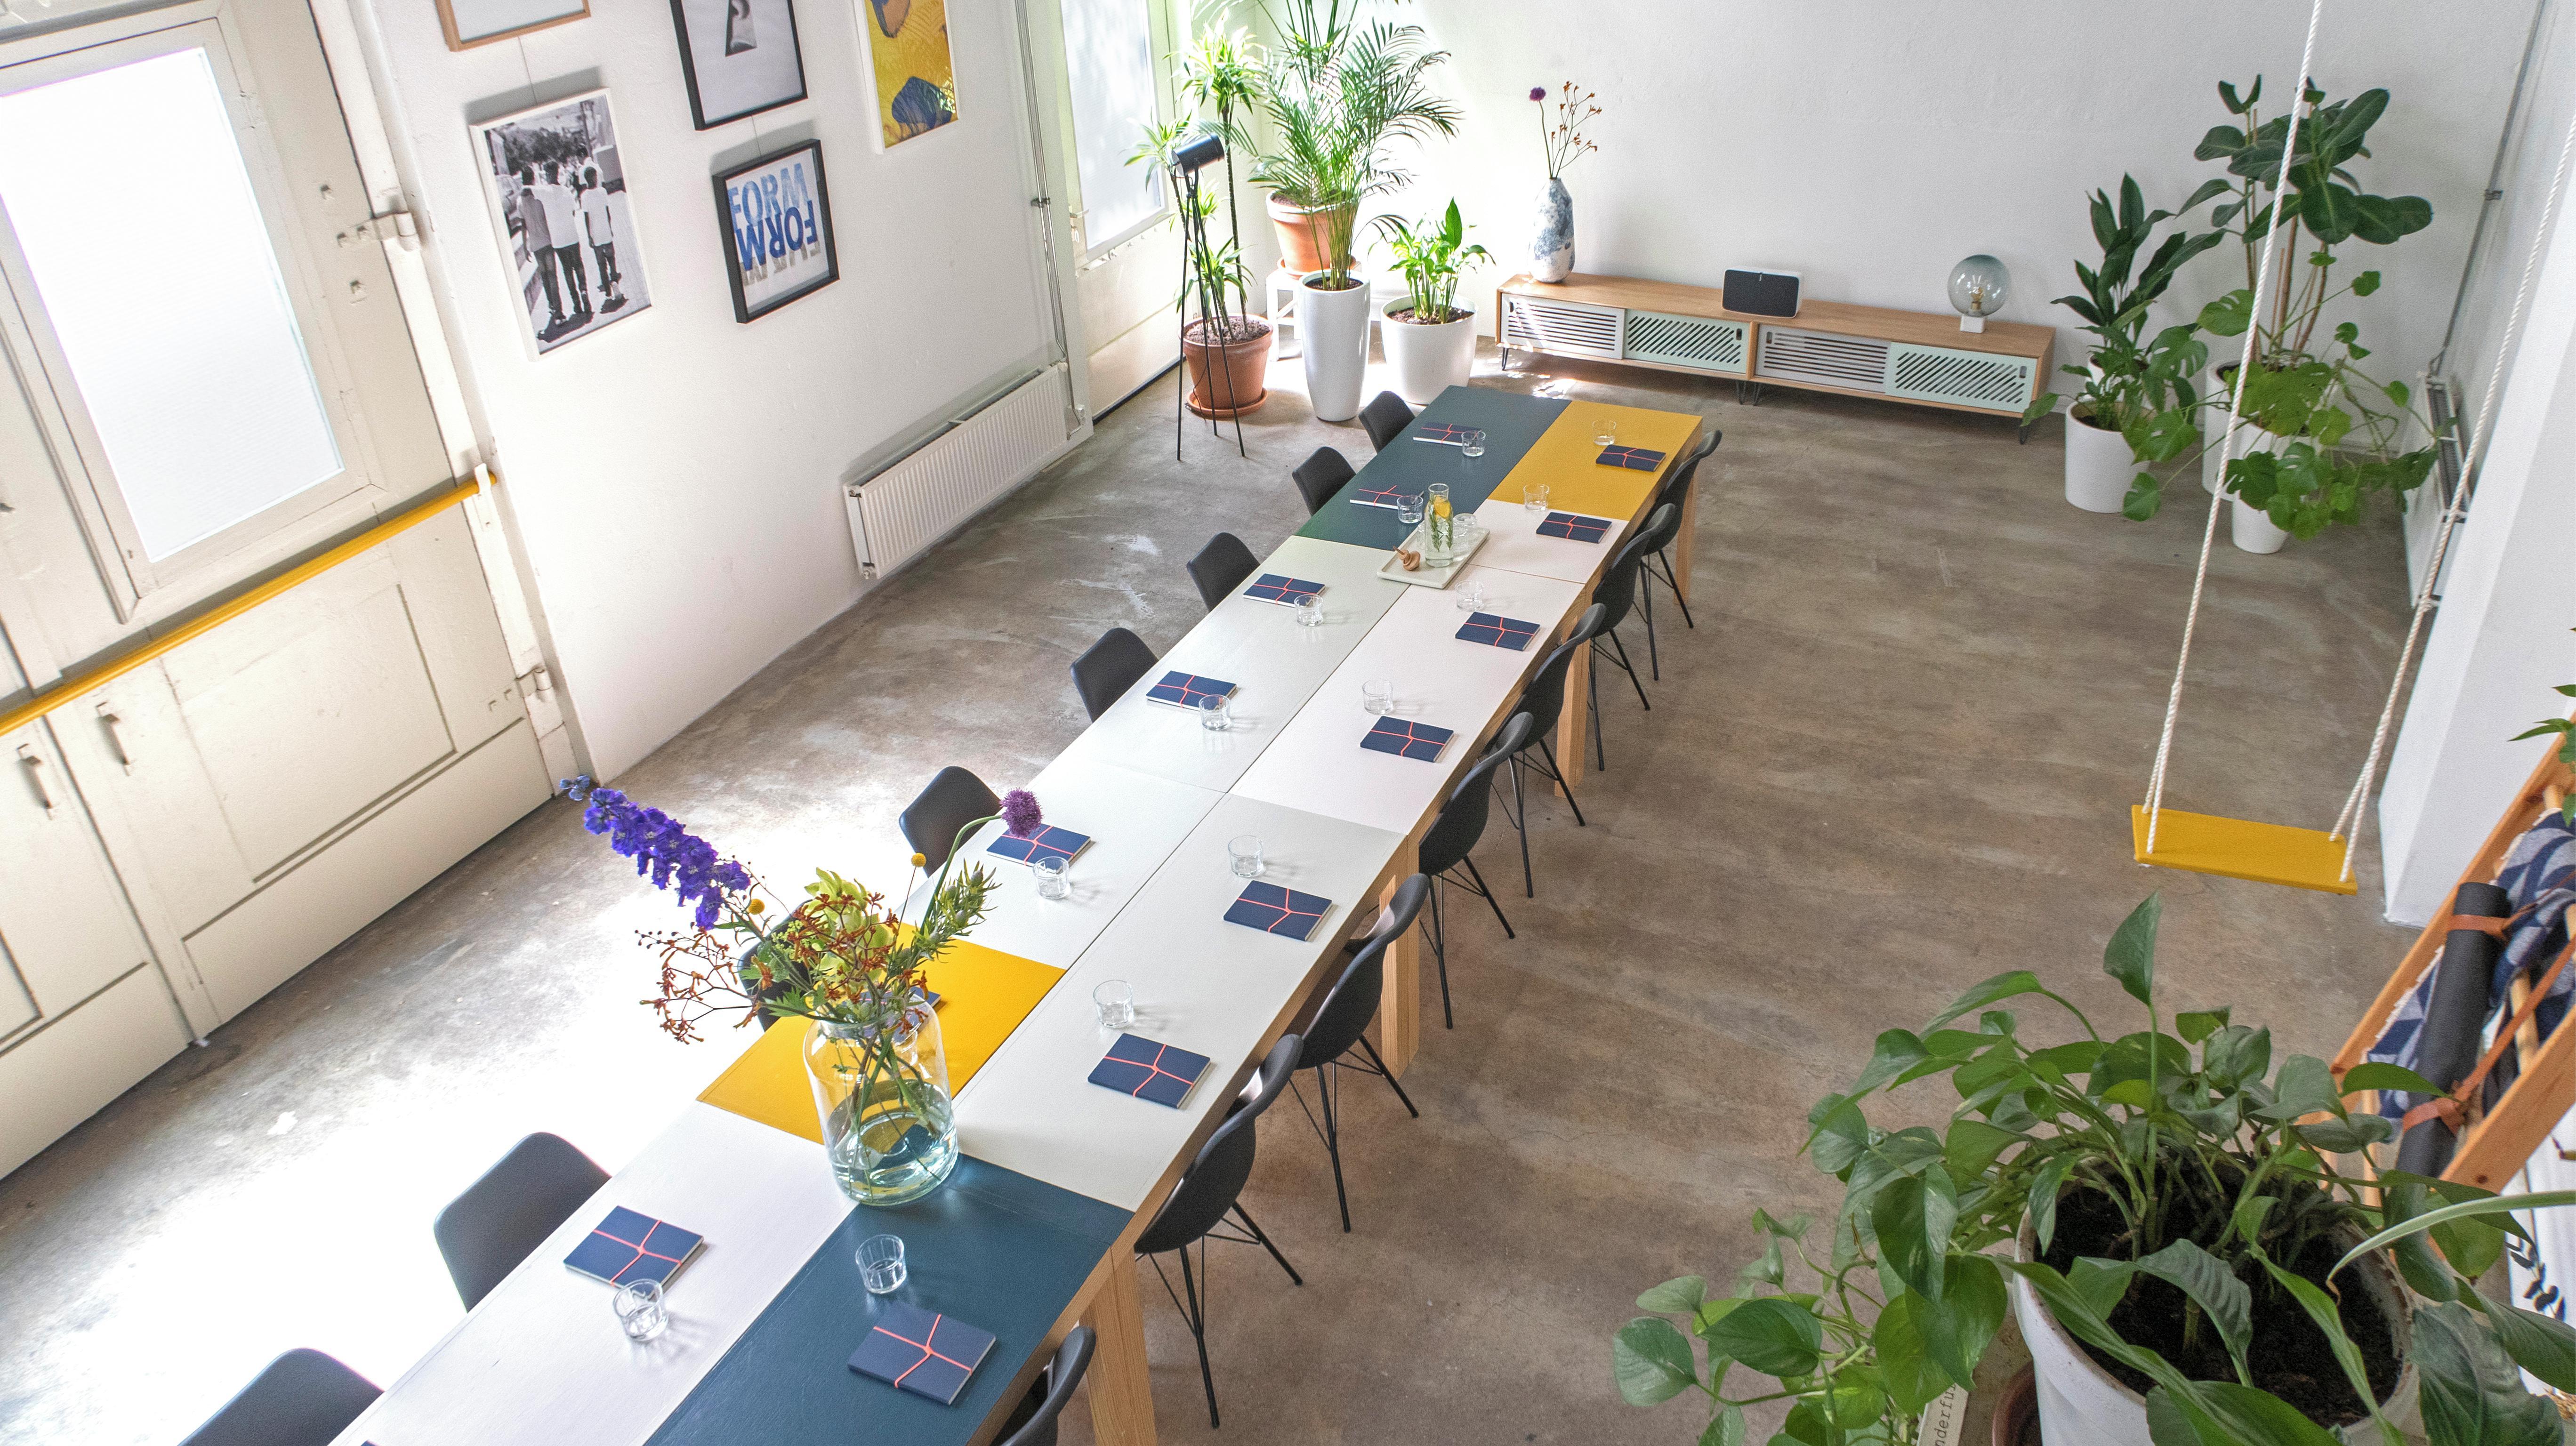 Amsterdam workshop spaces Loft  image 0